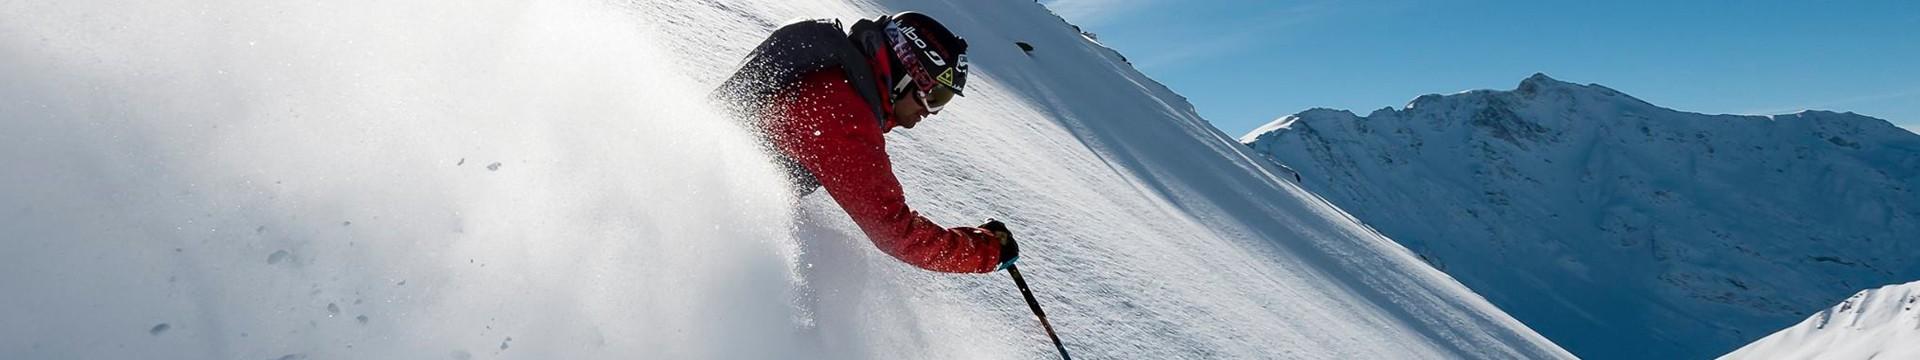 ski-06-8840-9841